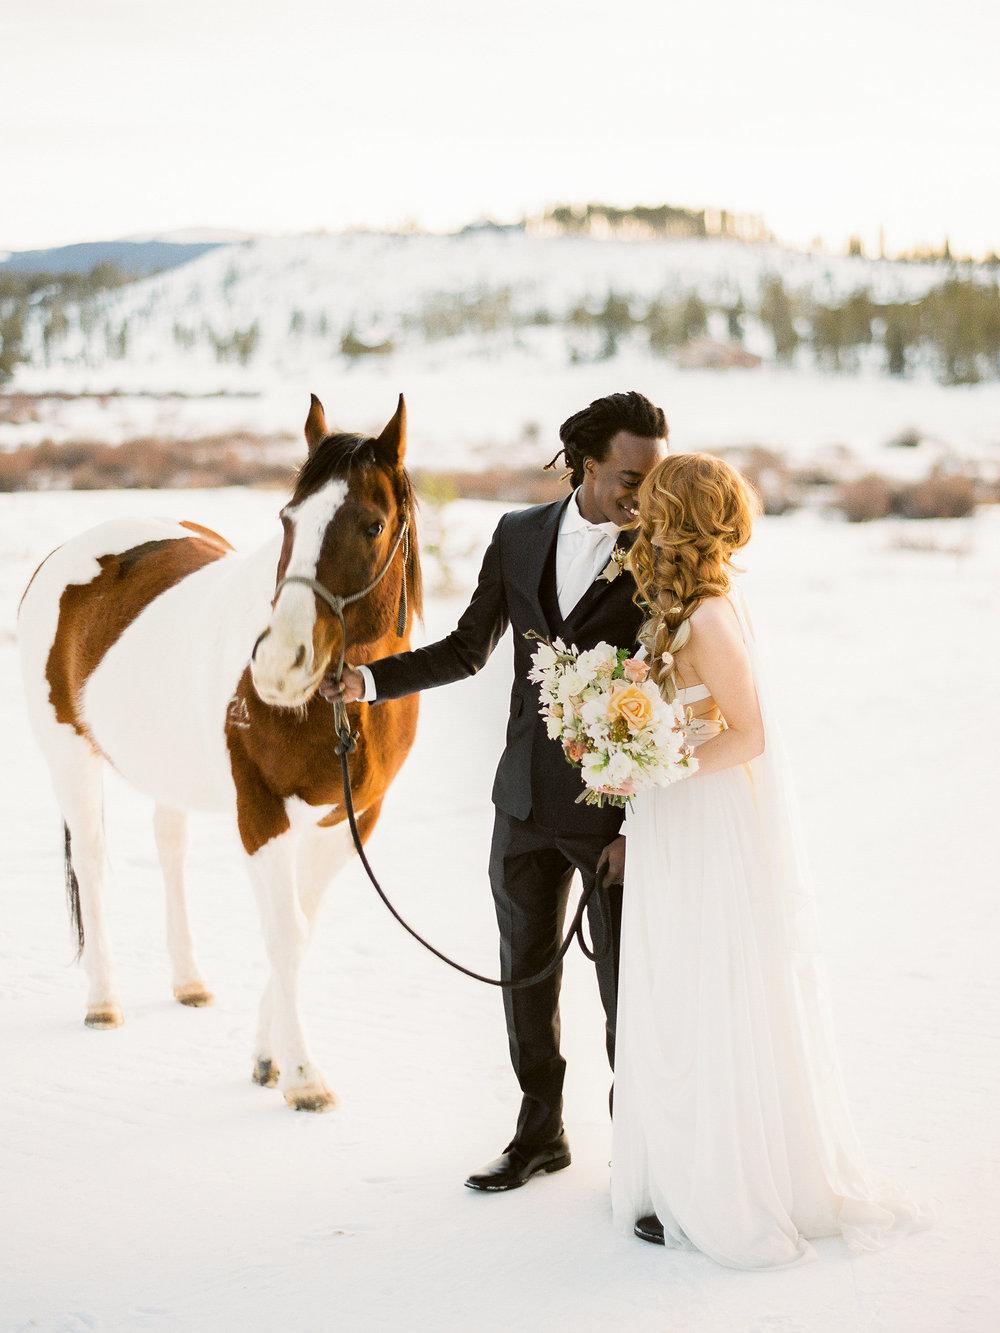 Dani-Cowan-Photography-Devils-Thumb-Ranch-Winter-Luxury-Wedding192.jpg